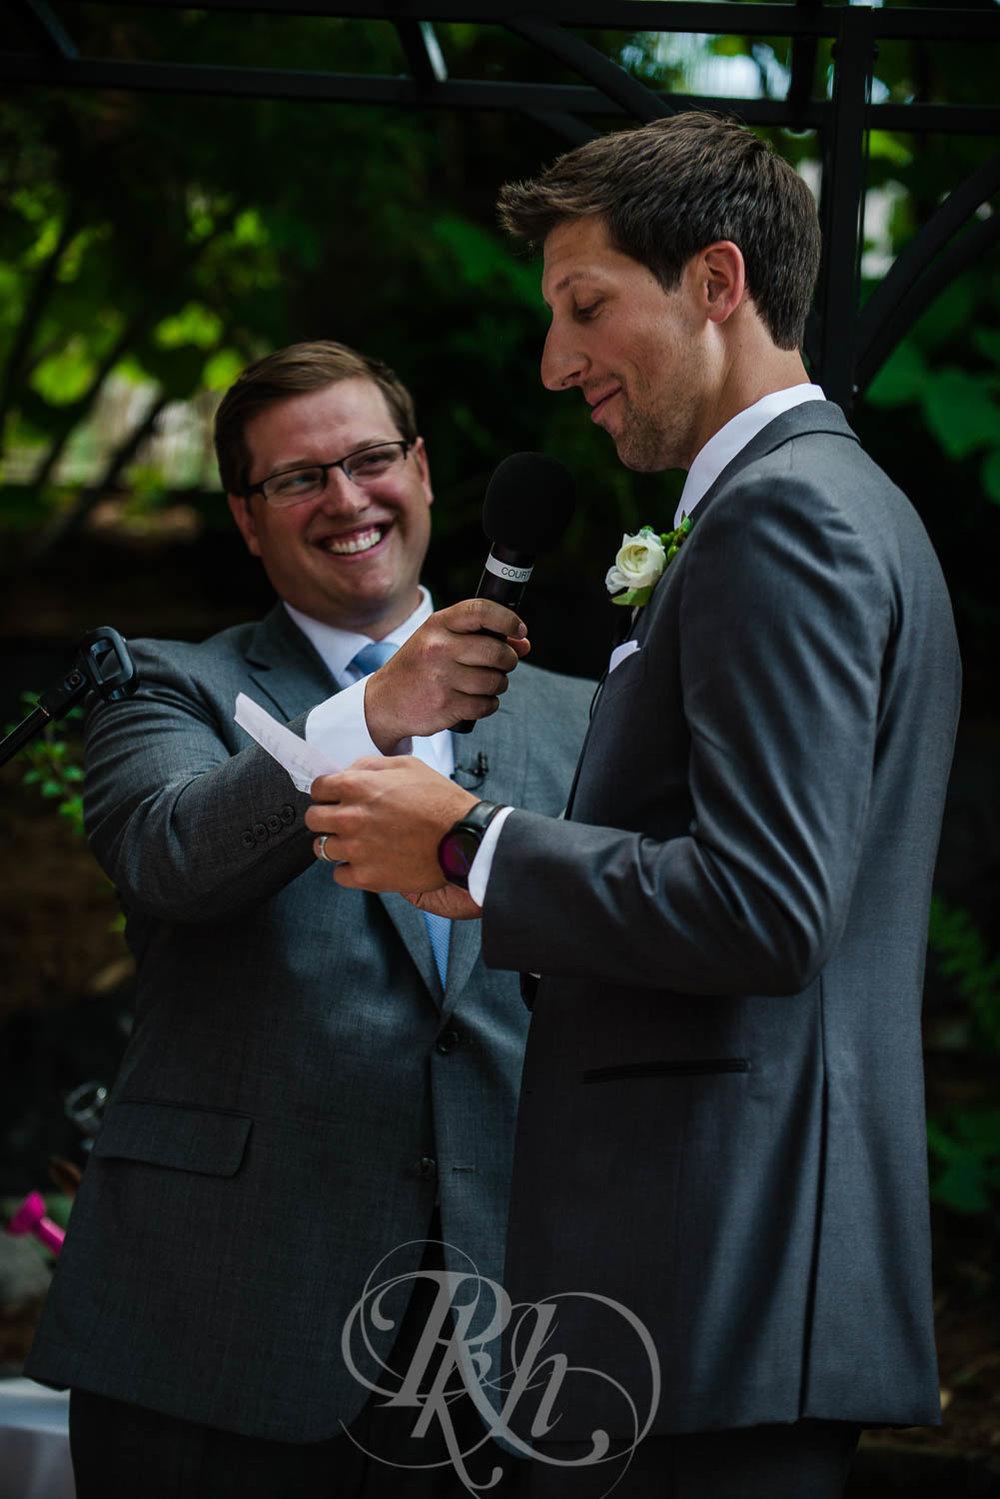 Megan & Jeff - Minnesota Wedding Photographer - Van Dusen Mansion - RKH Images - Blog  (17 of 37).jpg